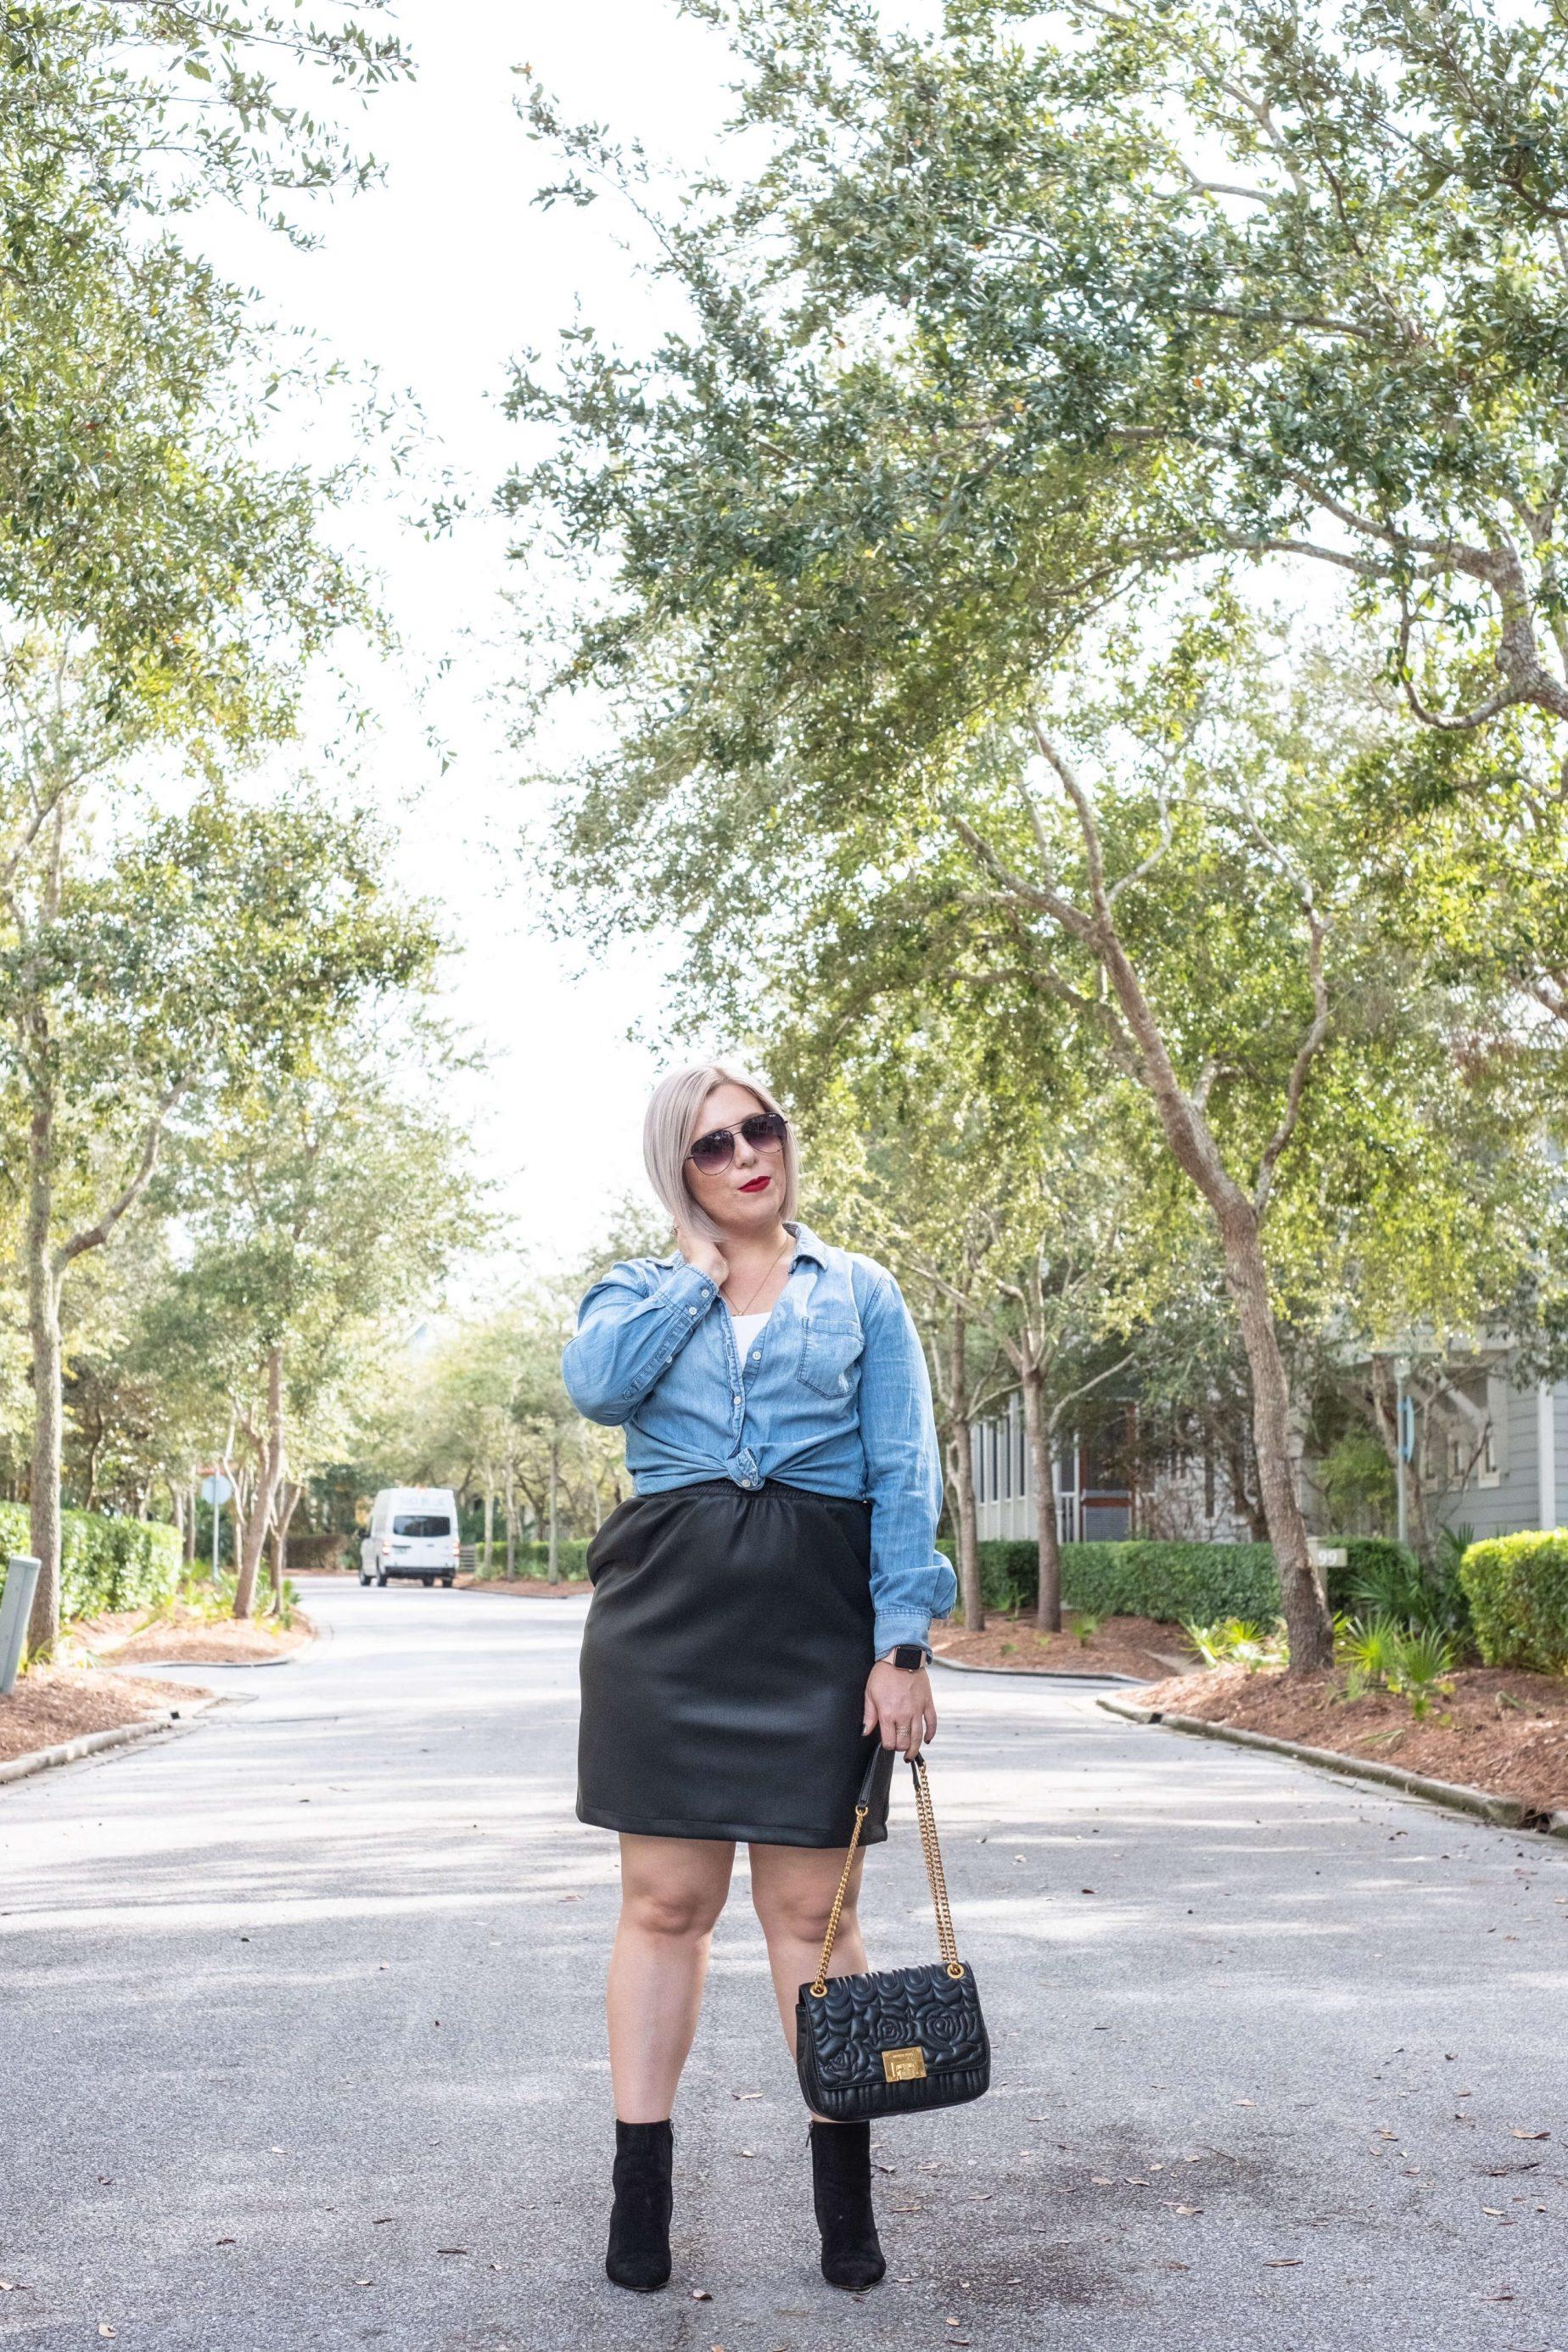 5 Tips For Shopping Your Closet #whatsavvysaid #wellnessblogger #fashionblogger #lifestyle #shopyourcloset #girlonabudget #curvystyle #shopyourwardrobe